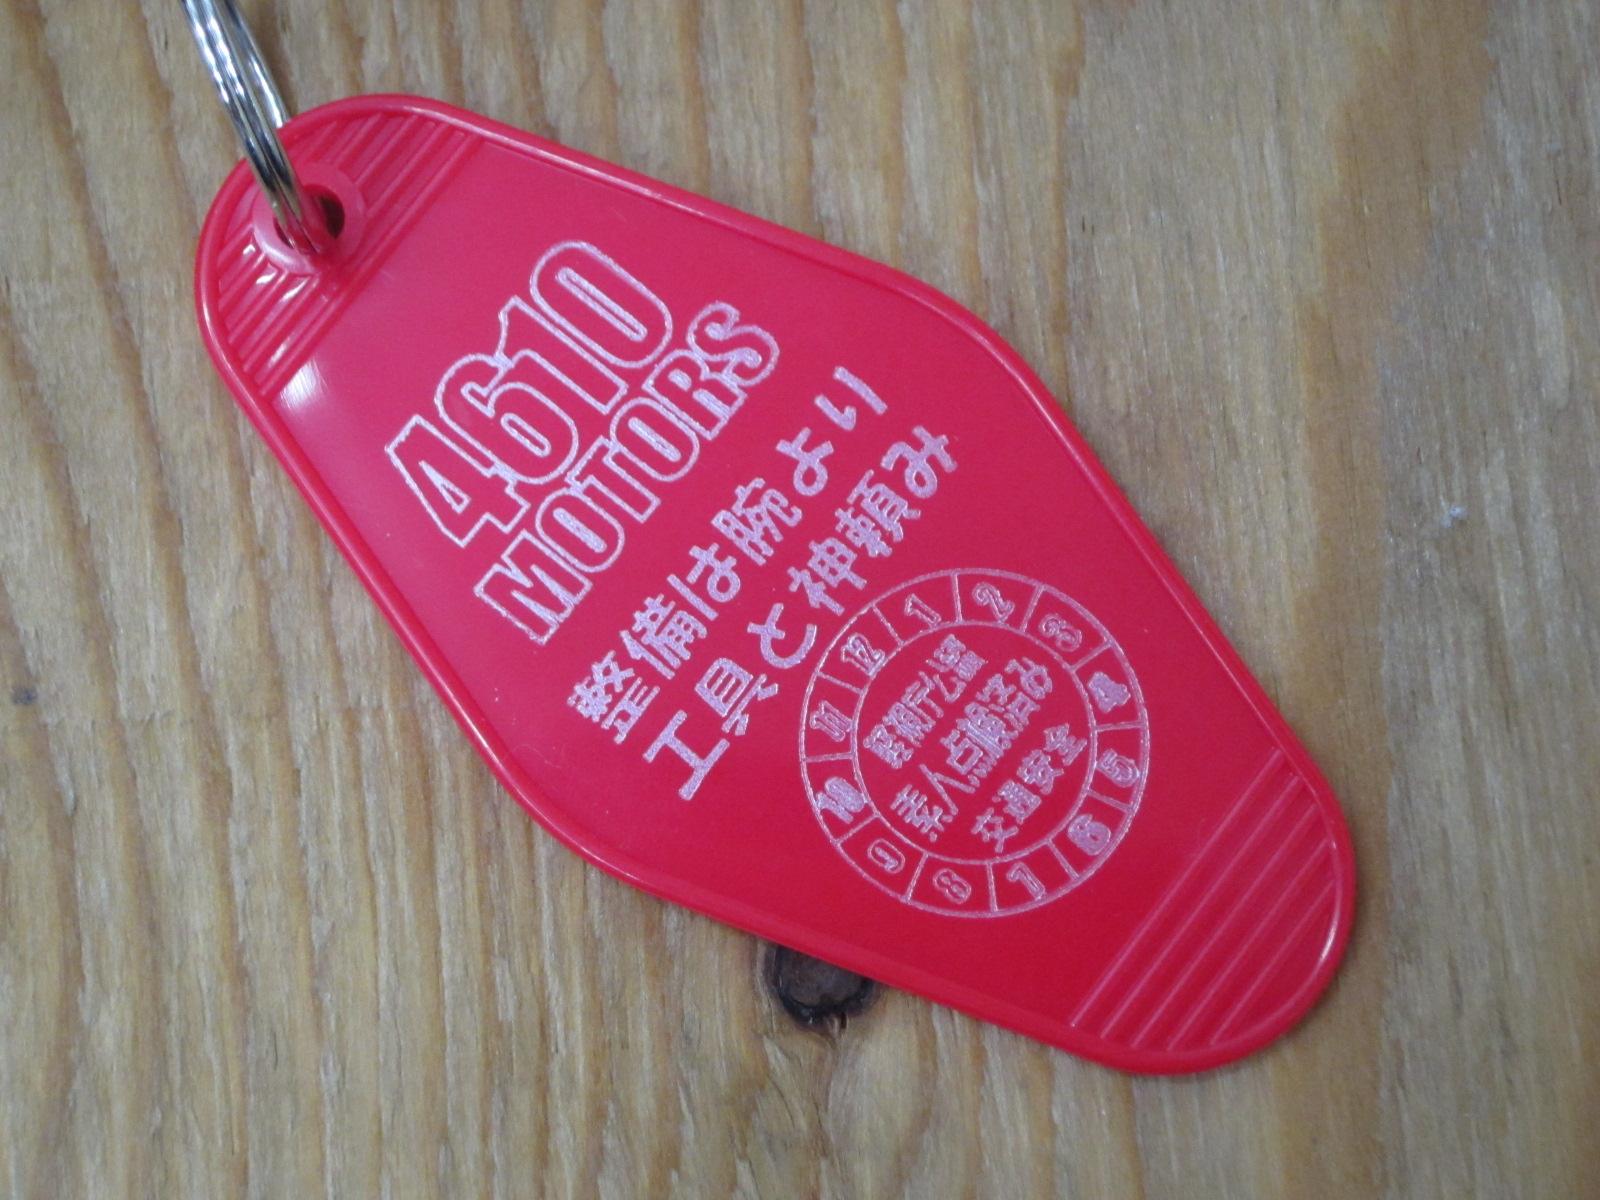 4610MOTORS MOTEL Key Ring RED シロウトモータース★MOTEL K/R☆モーテルキーリング★赤